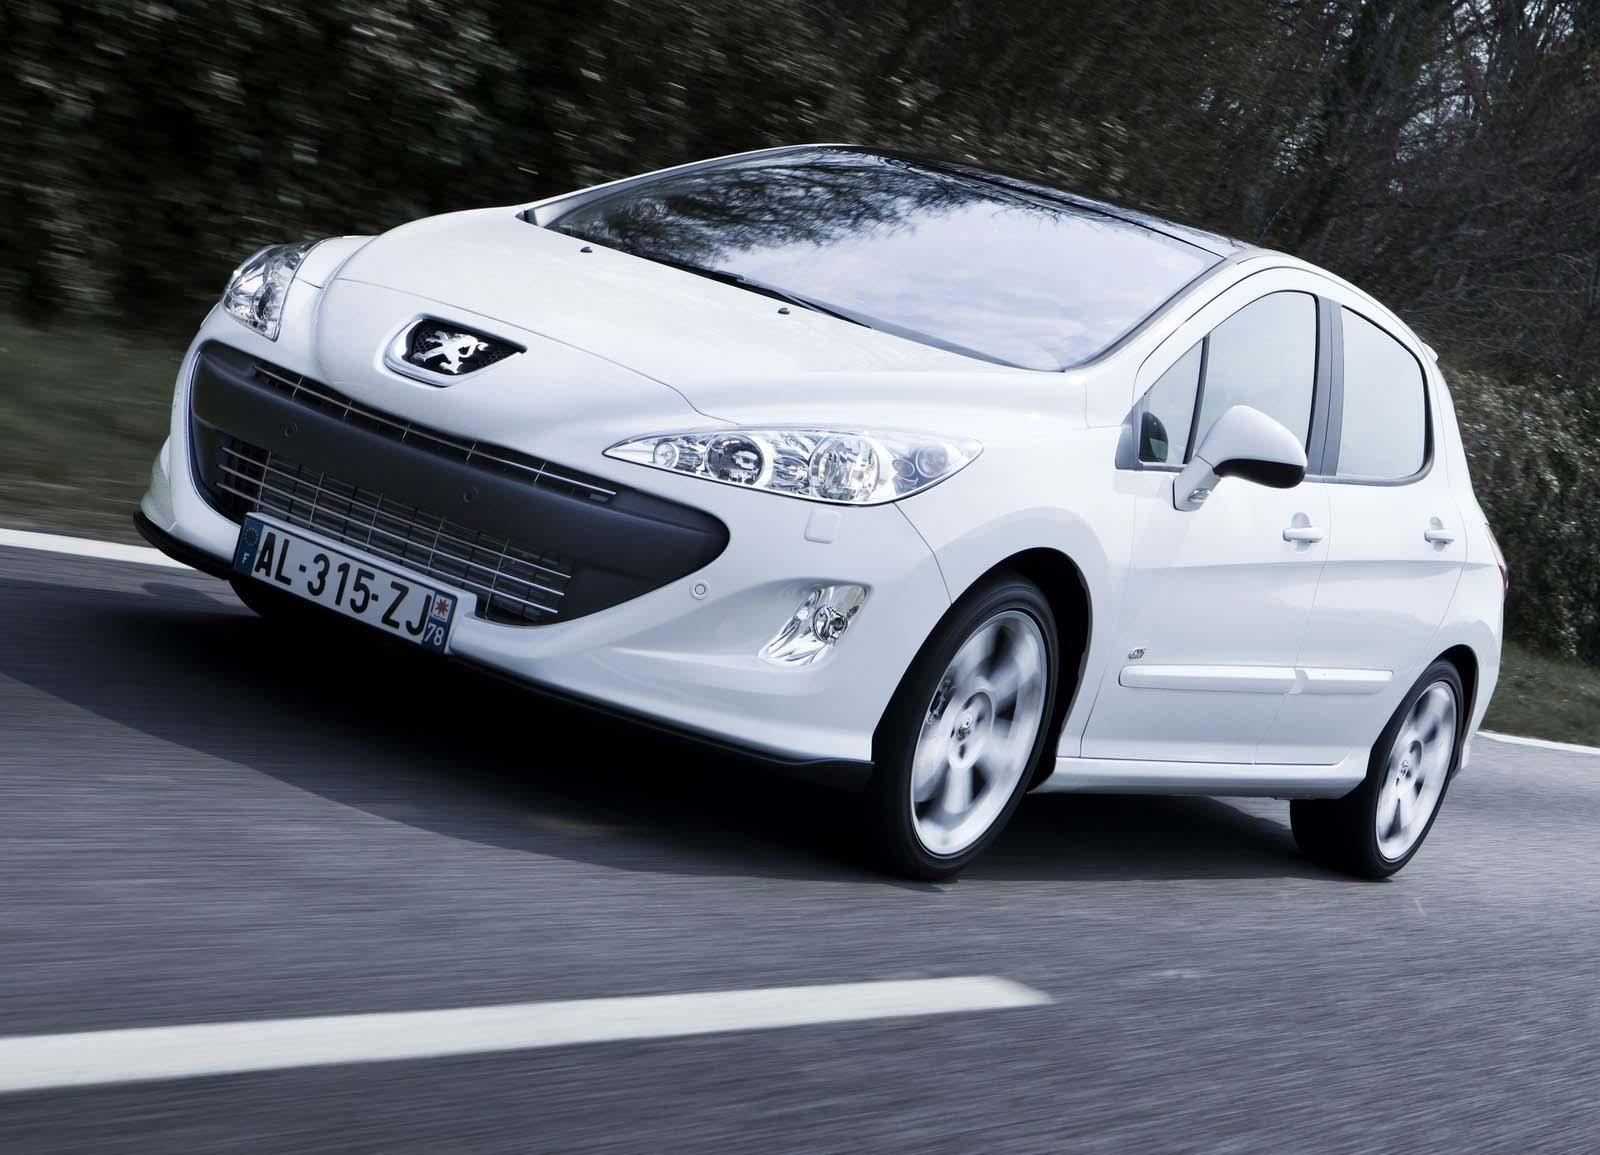 http://3.bp.blogspot.com/_FpC-eLEpDtM/TAuy7rHn31I/AAAAAAAAdlo/co4w0r9HoxU/s1600/Peugeot_308_GTi_2011_1_topcarpsuperos.blogspot.com.jpg